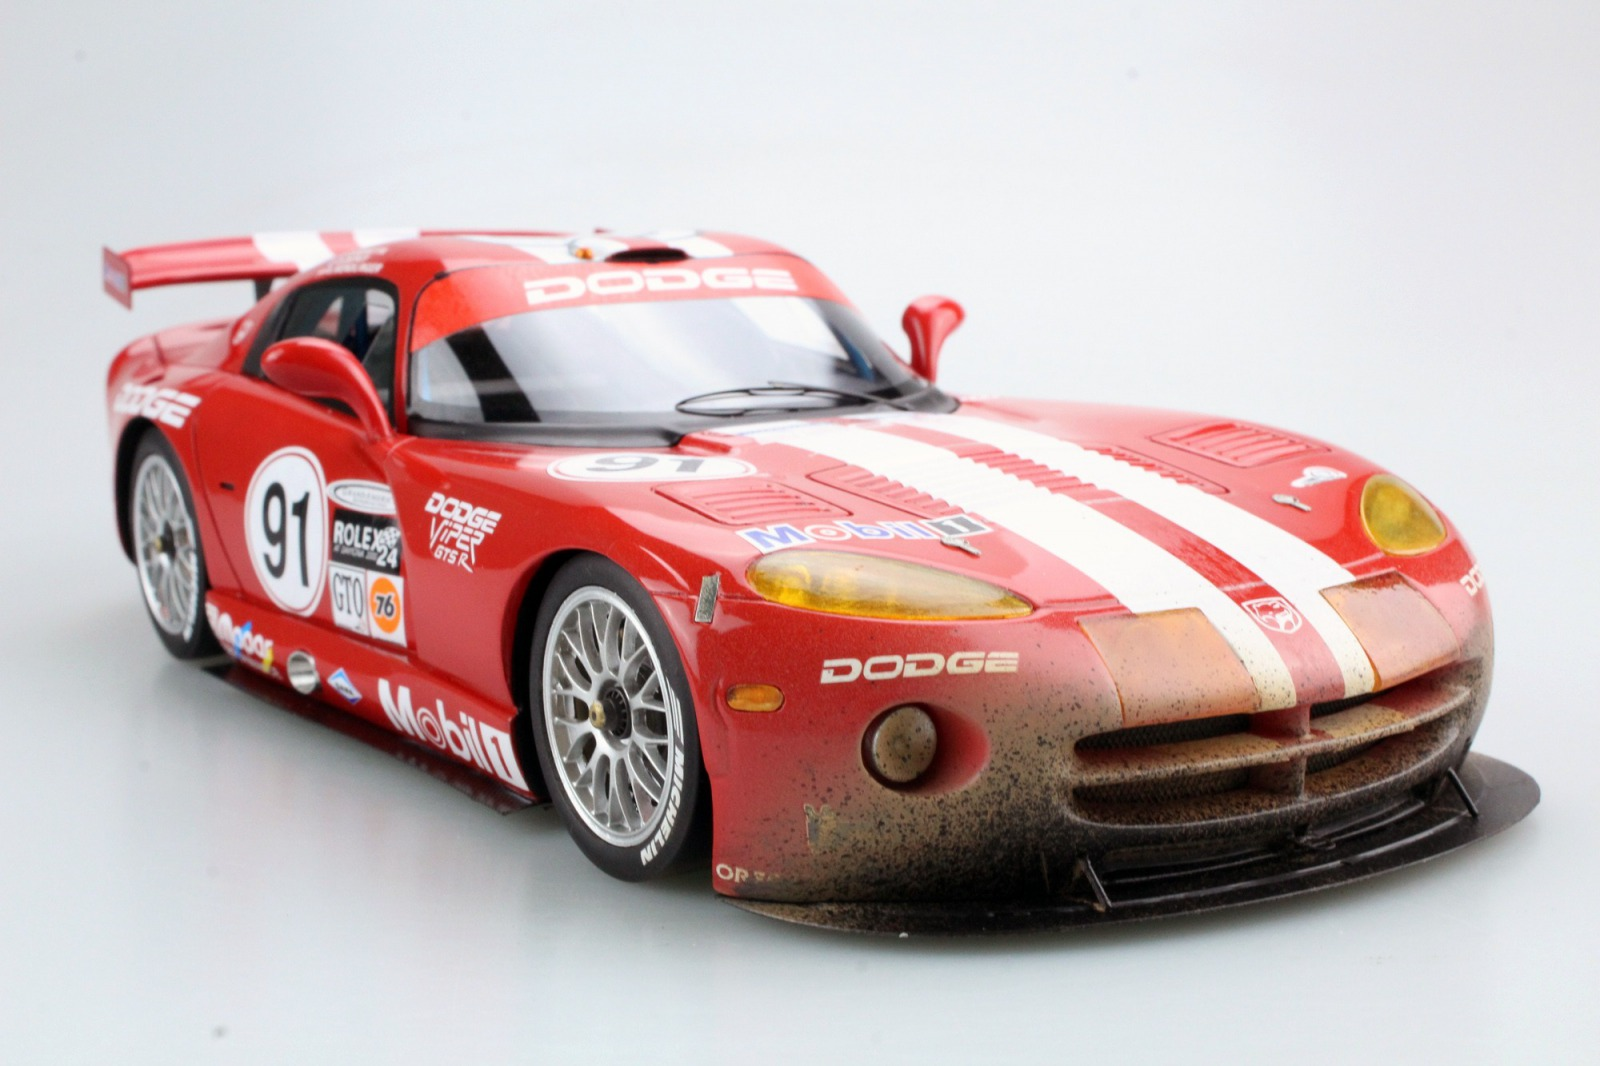 Top Marques 1:18 2000年Daytona優勝モデル ダッジ ヴァイパー GTS-R 8.0L V10 No.91 ダーティバージョン1:18 Top Marques Dodge/Chrysler Viper GTS-R Oreca Daytona Winner 2000 dirty 1/18 by Top Marques NEW